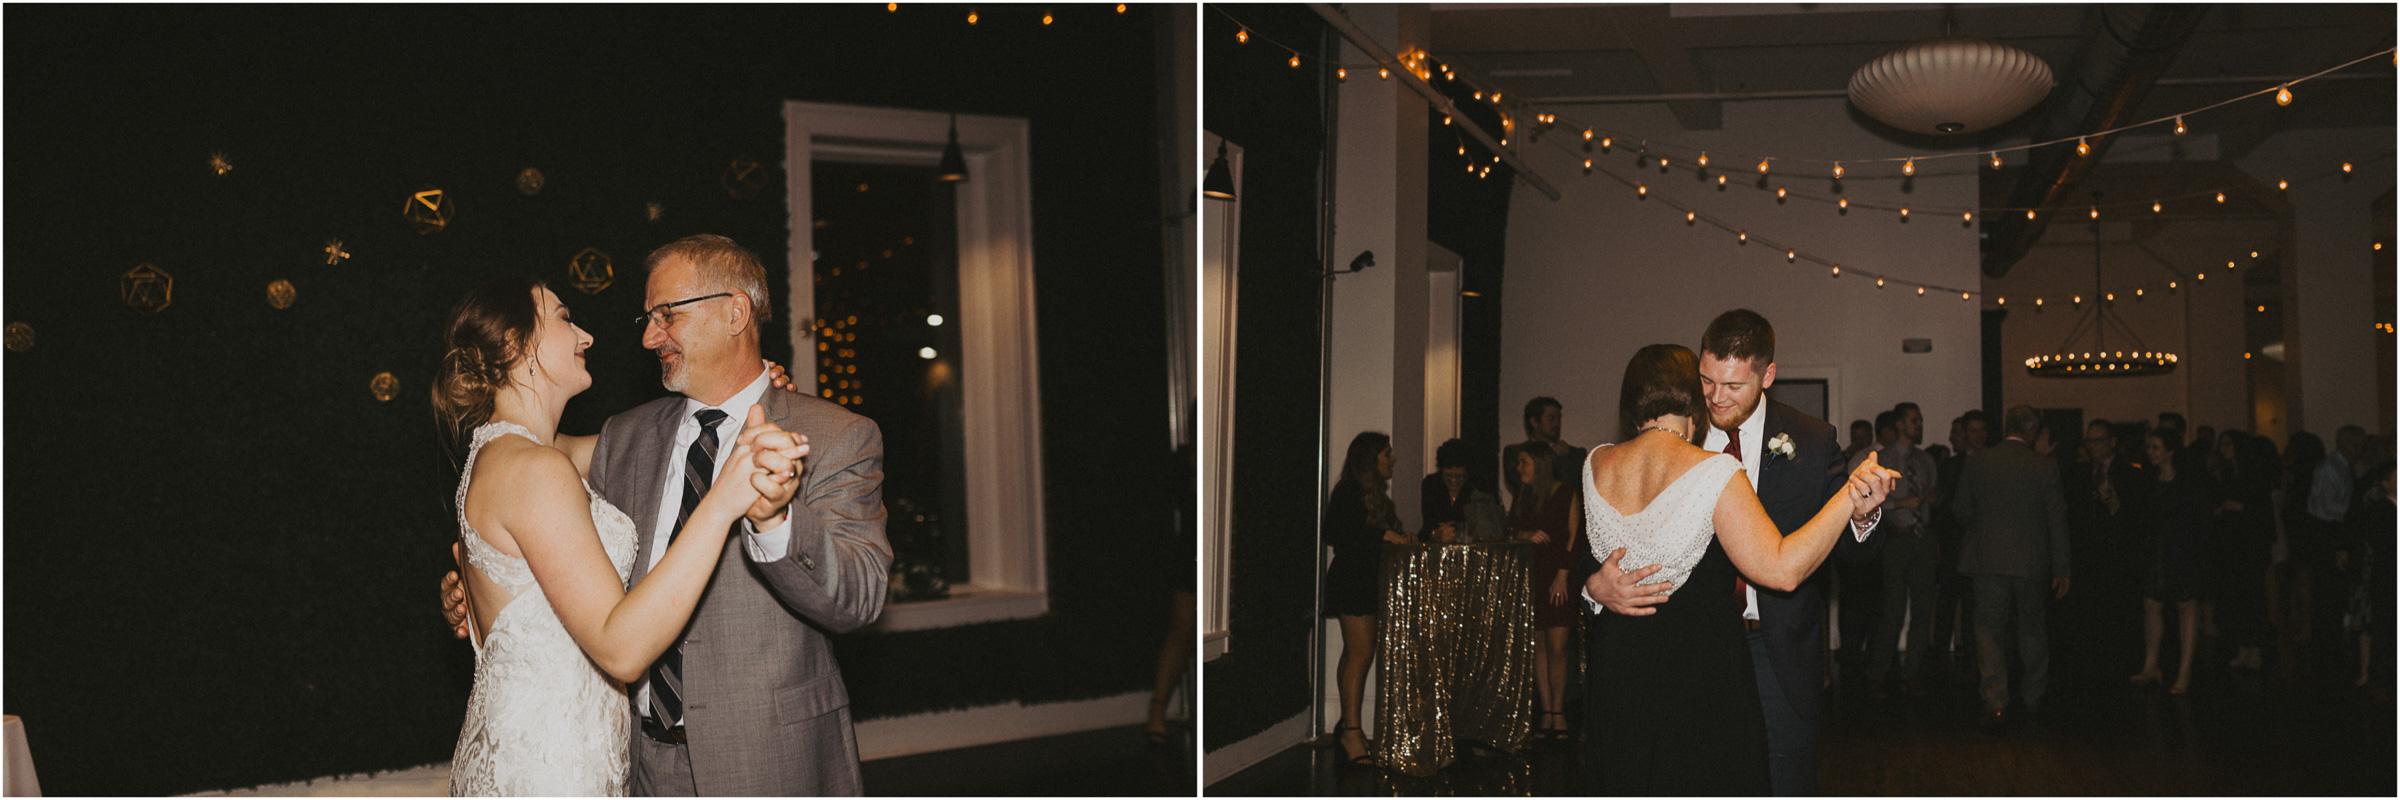 alyssa barletter photography 2016 main kansas city wedding rainy day photographer grace and justin magott-80.jpg